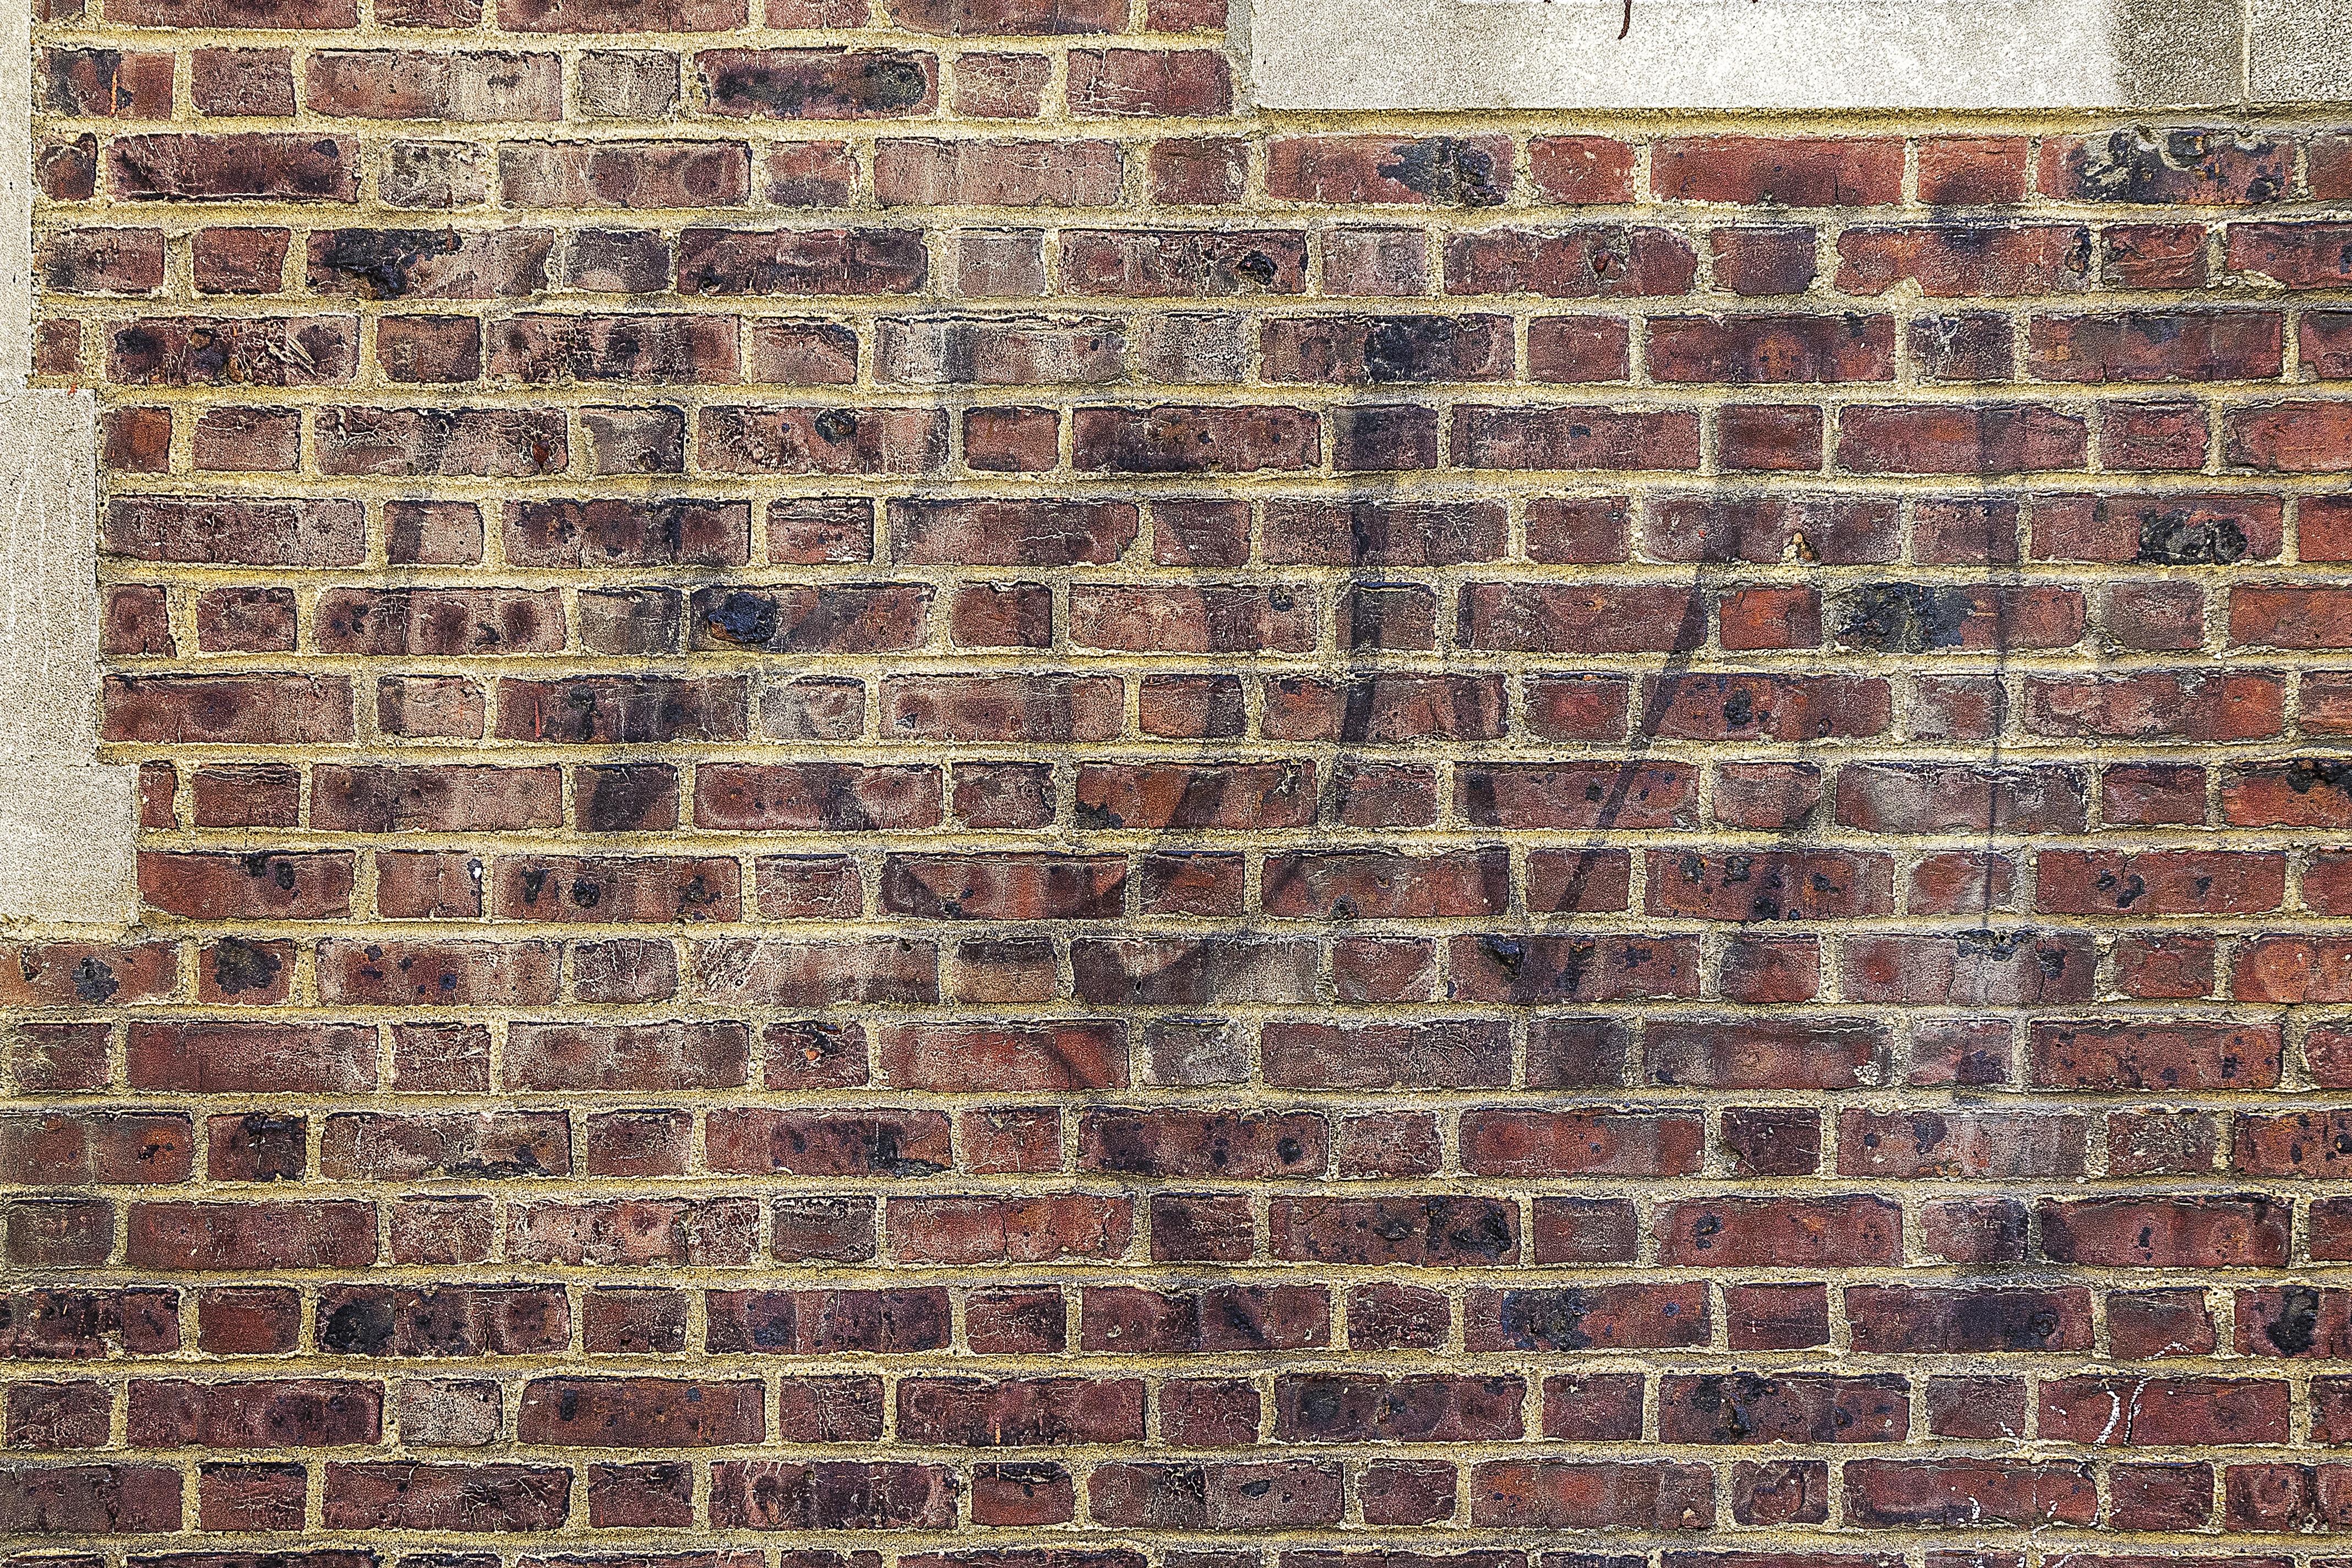 Free Images Grungy Urban Grunge Graffiti Material Brick Wall